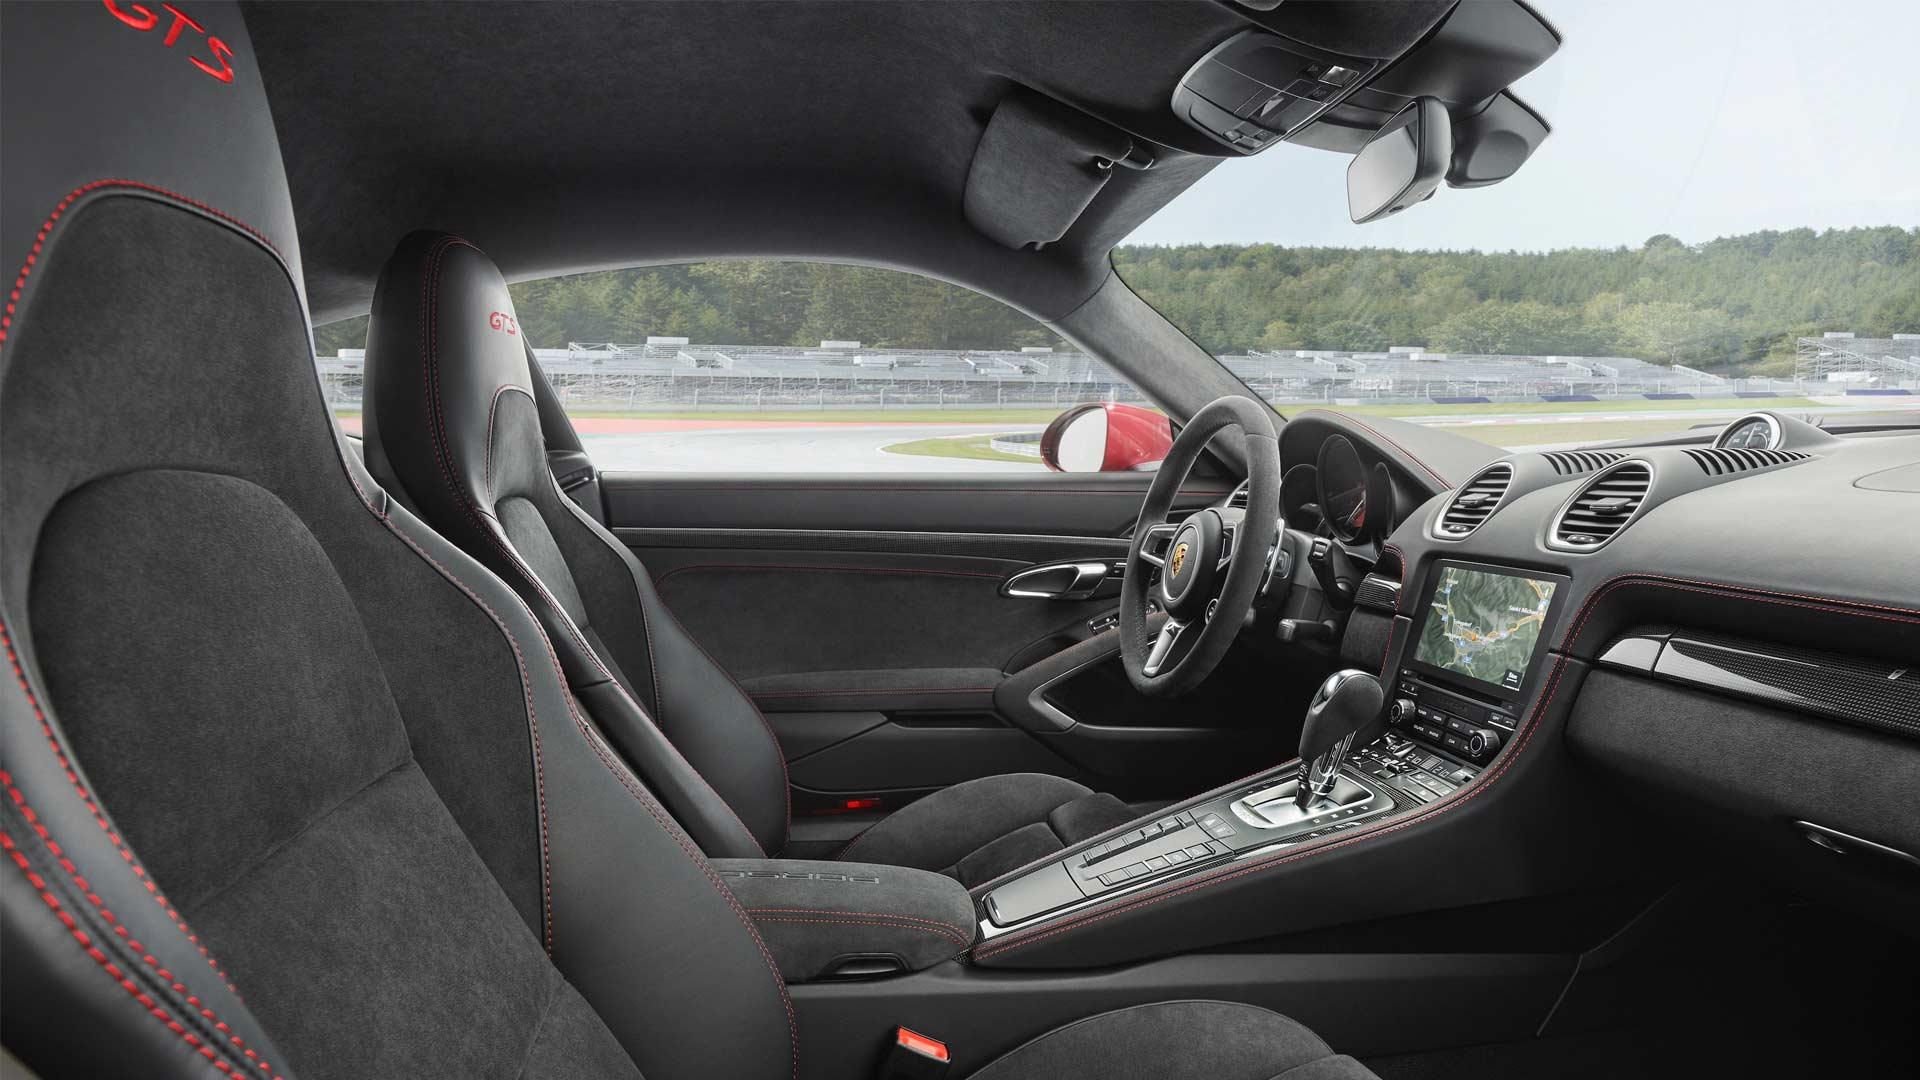 2018-New-Porsche-718-Cayman-GTS-718-Boxster-GTS-interior_2